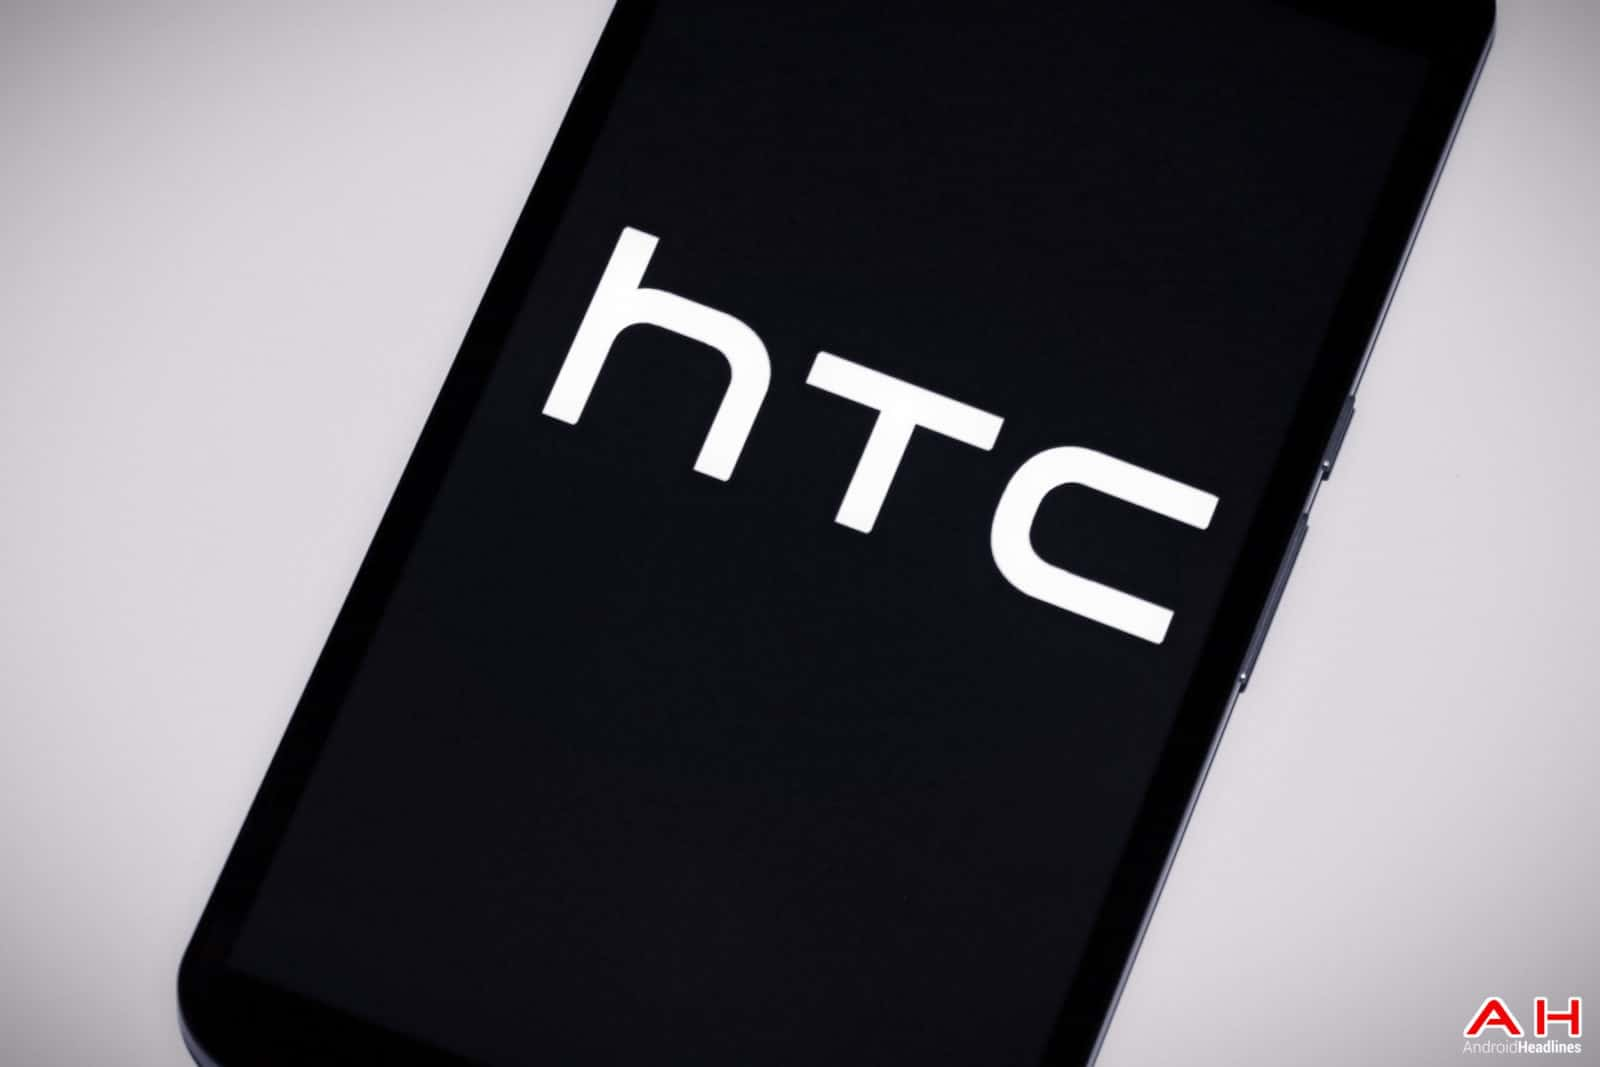 AH 2015 HTC LOGO Chris Sept-19